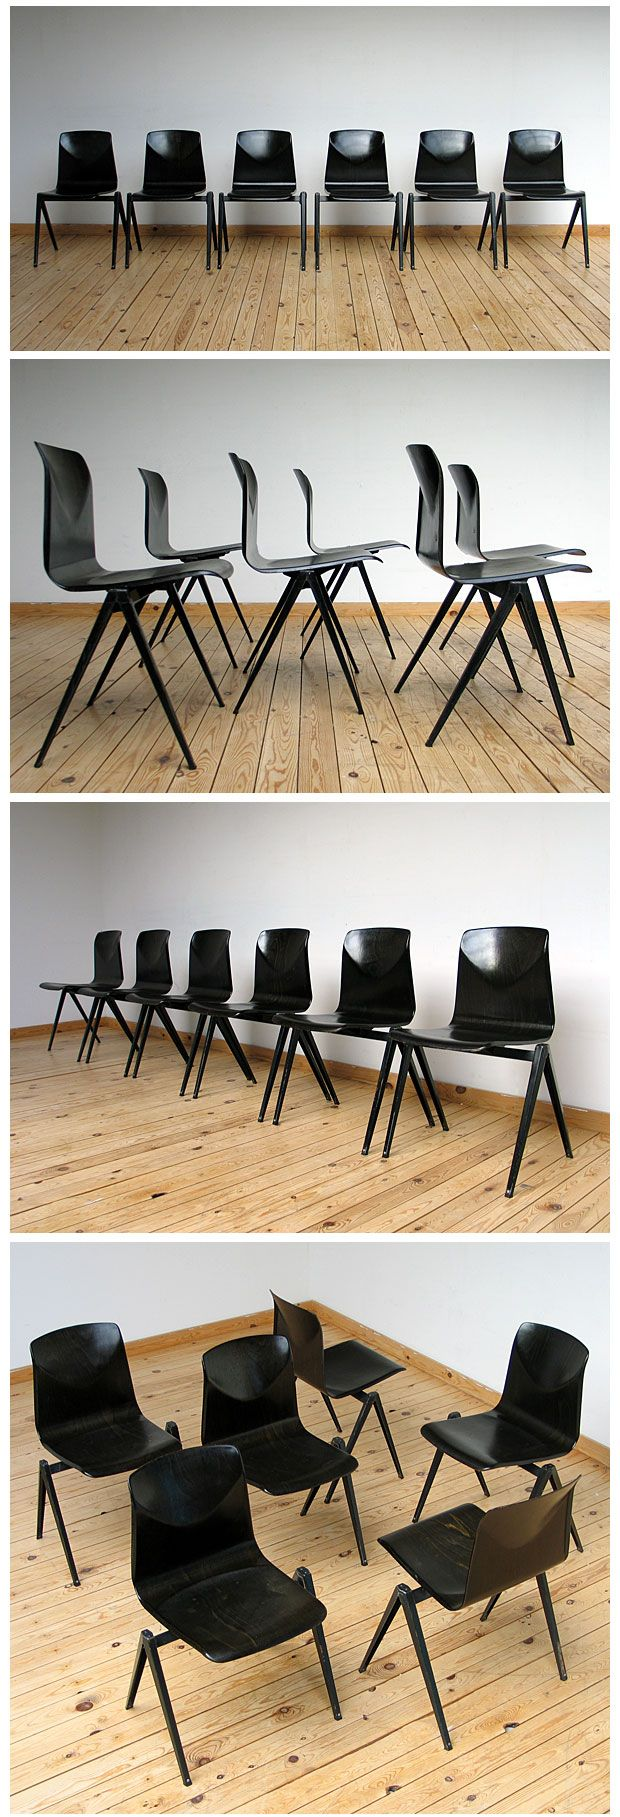 Industrial plywood school chairs by Friso Kramer